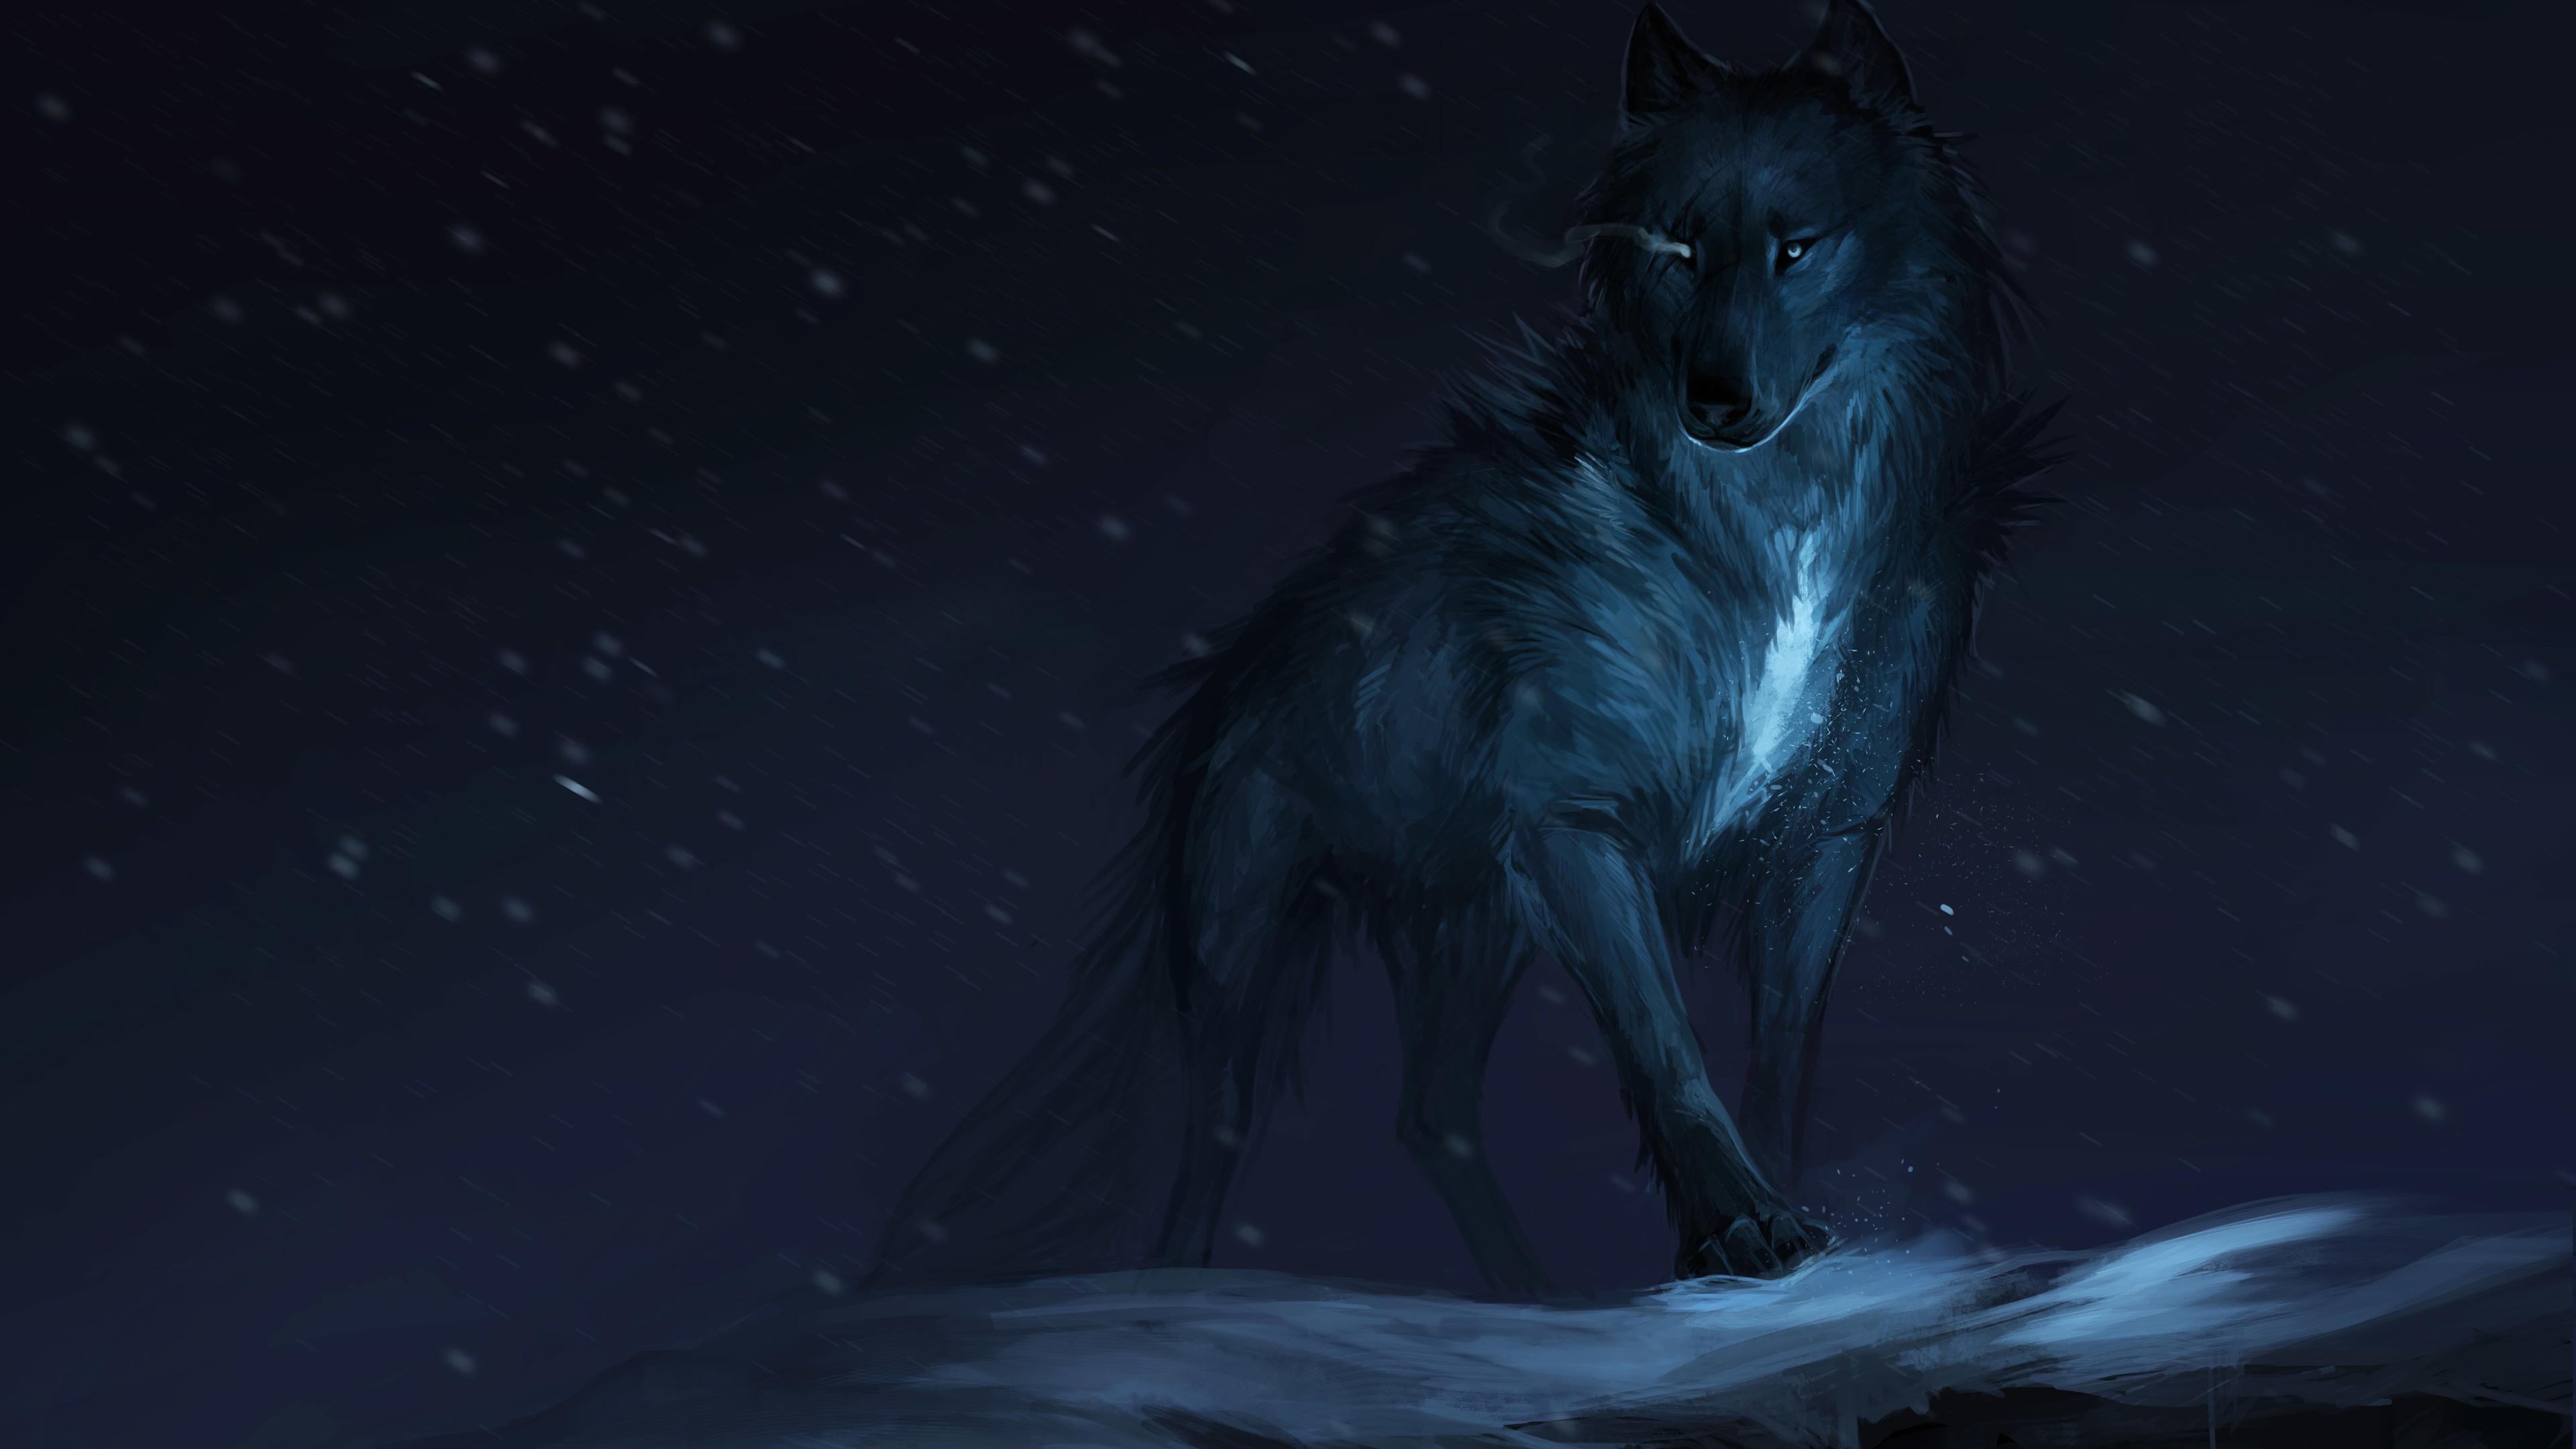 Wallpaper 4k Wolf Drawing 4k artist ...